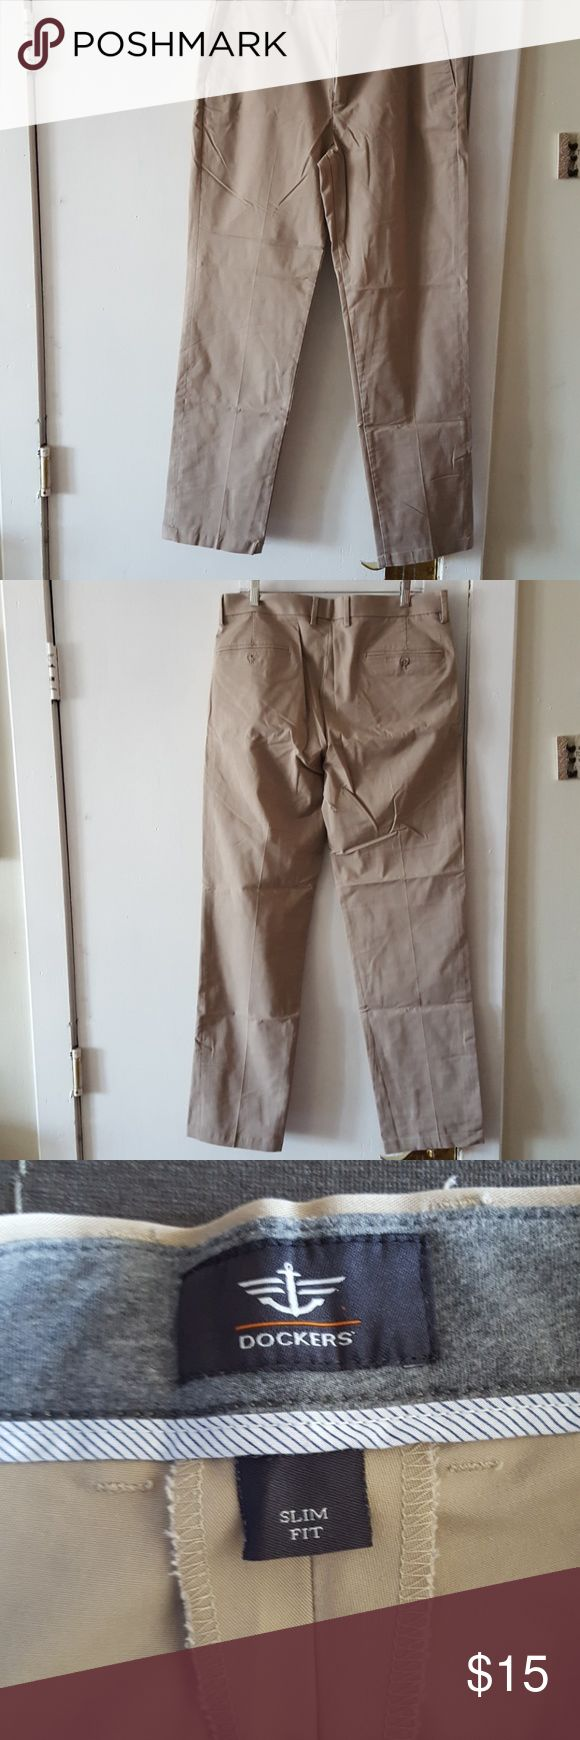 Dockers slim fit khaki pant 36x34 flat front pant. Excellent condition. Dockers Pants Chinos & Khakis